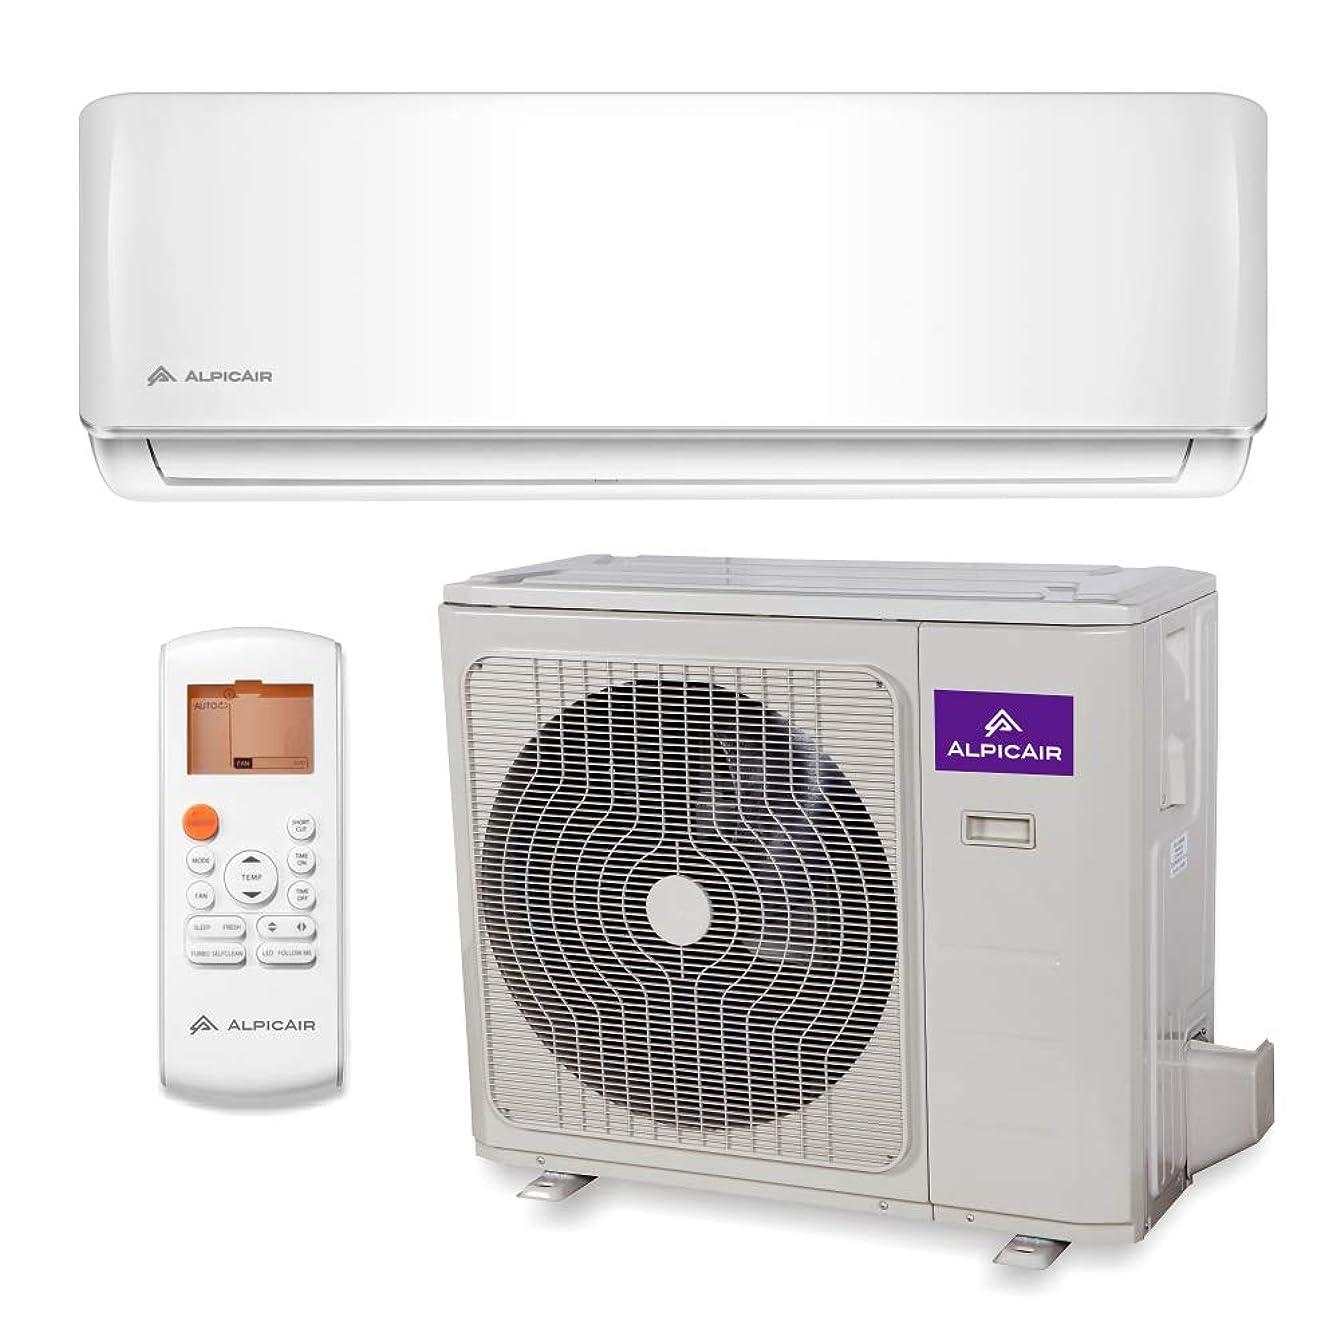 AlpicAir 12,000 BTU Ductless Mini Split Air Conditioner System Inverter Heat Pump